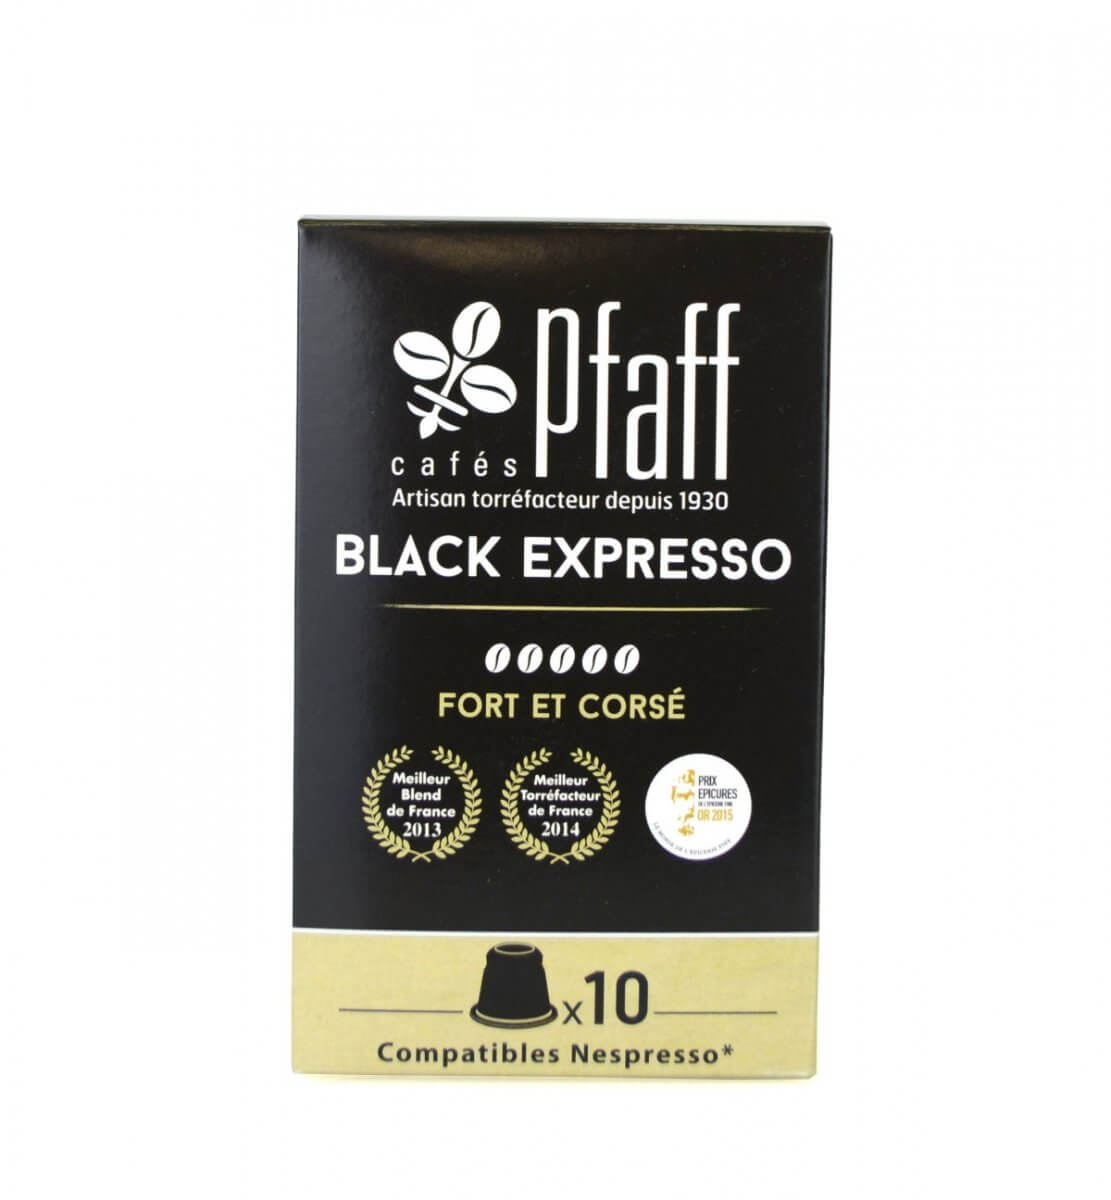 blackexpresso capsules compatibles nespresso cafes pfaff